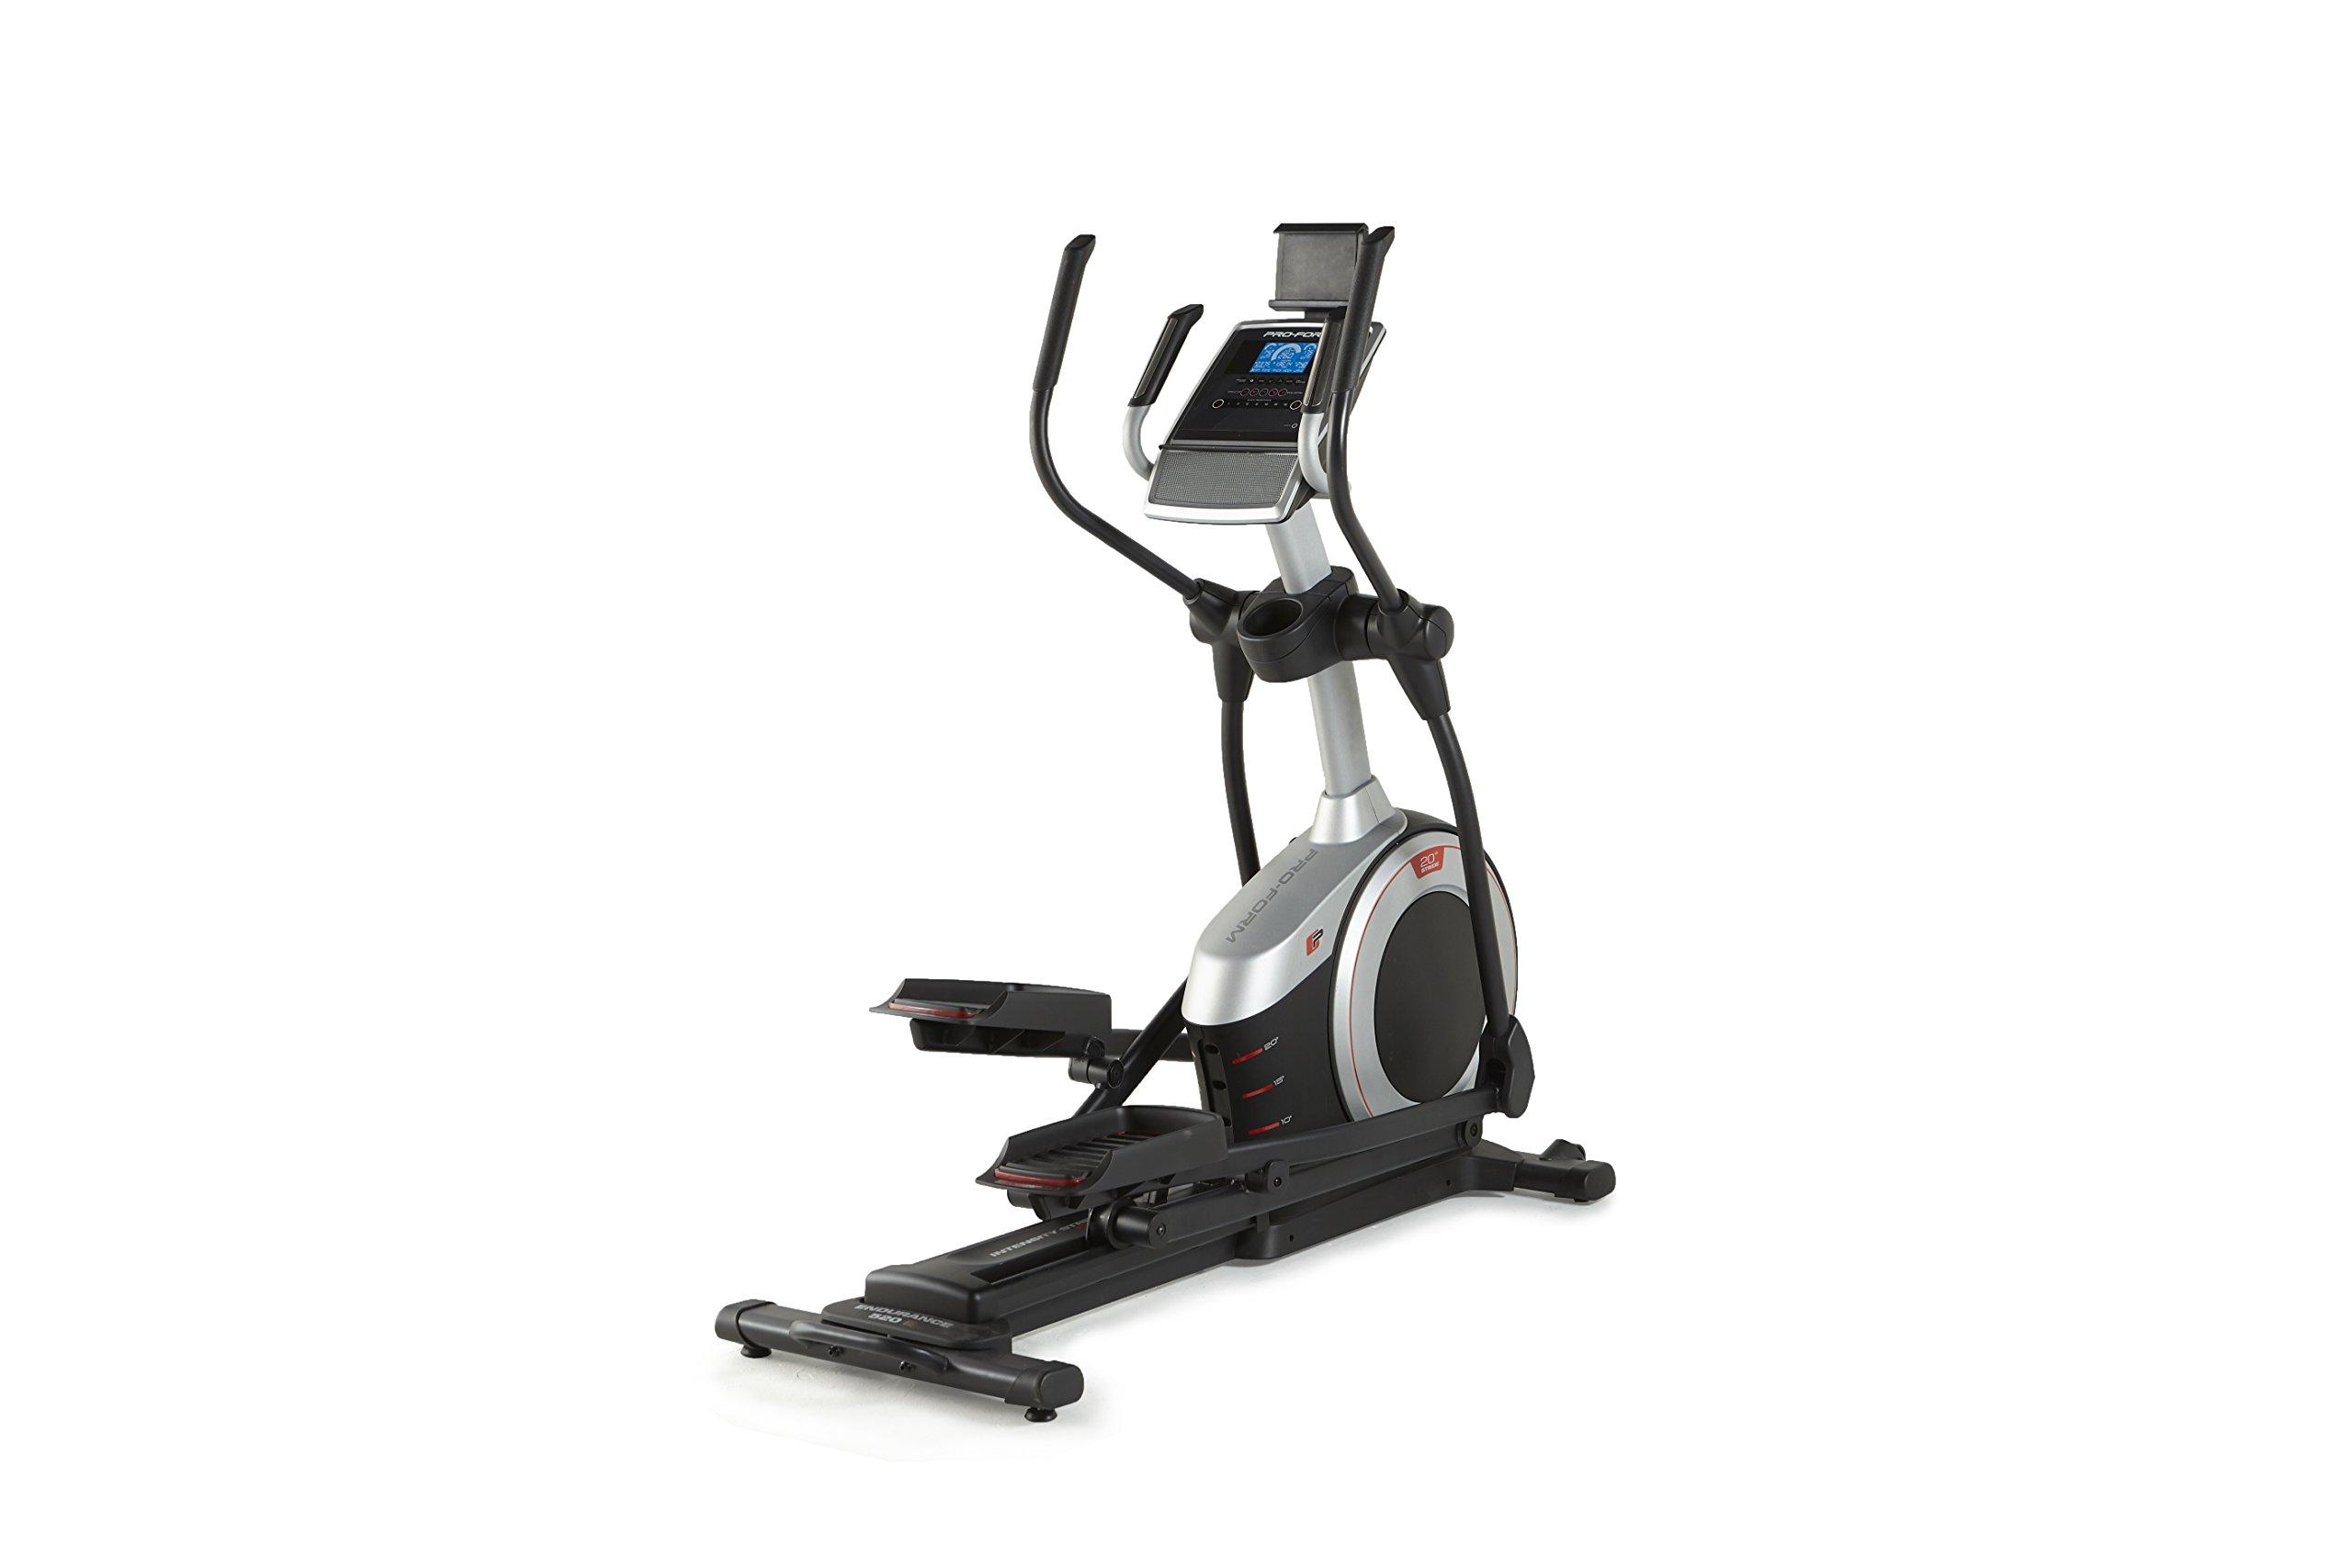 ProForm PFEL55916 Endurance 520 Elliptical